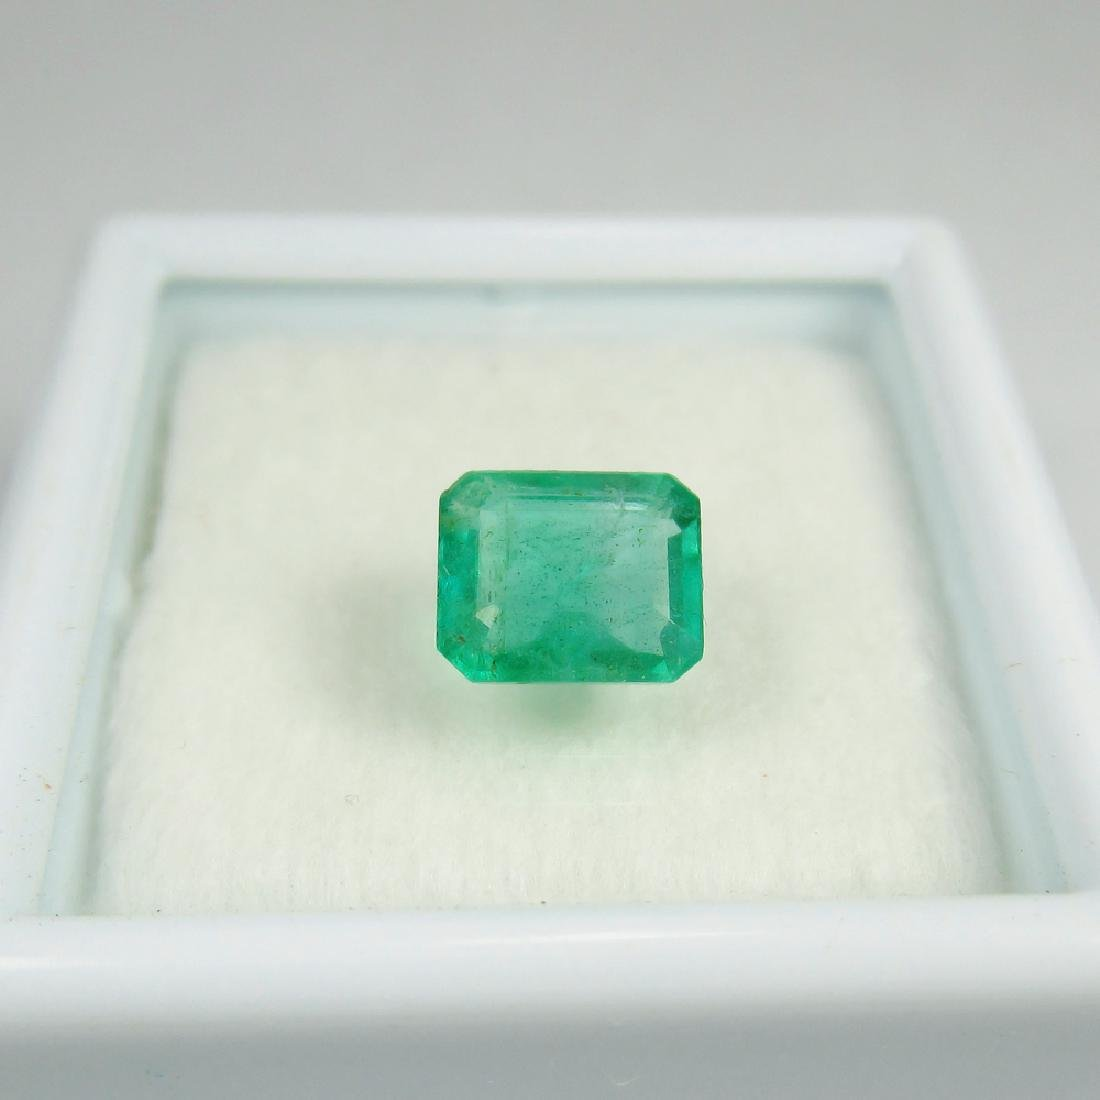 IGI Certified 1.11 Ct Genuine Zambian Emerald Good - 2